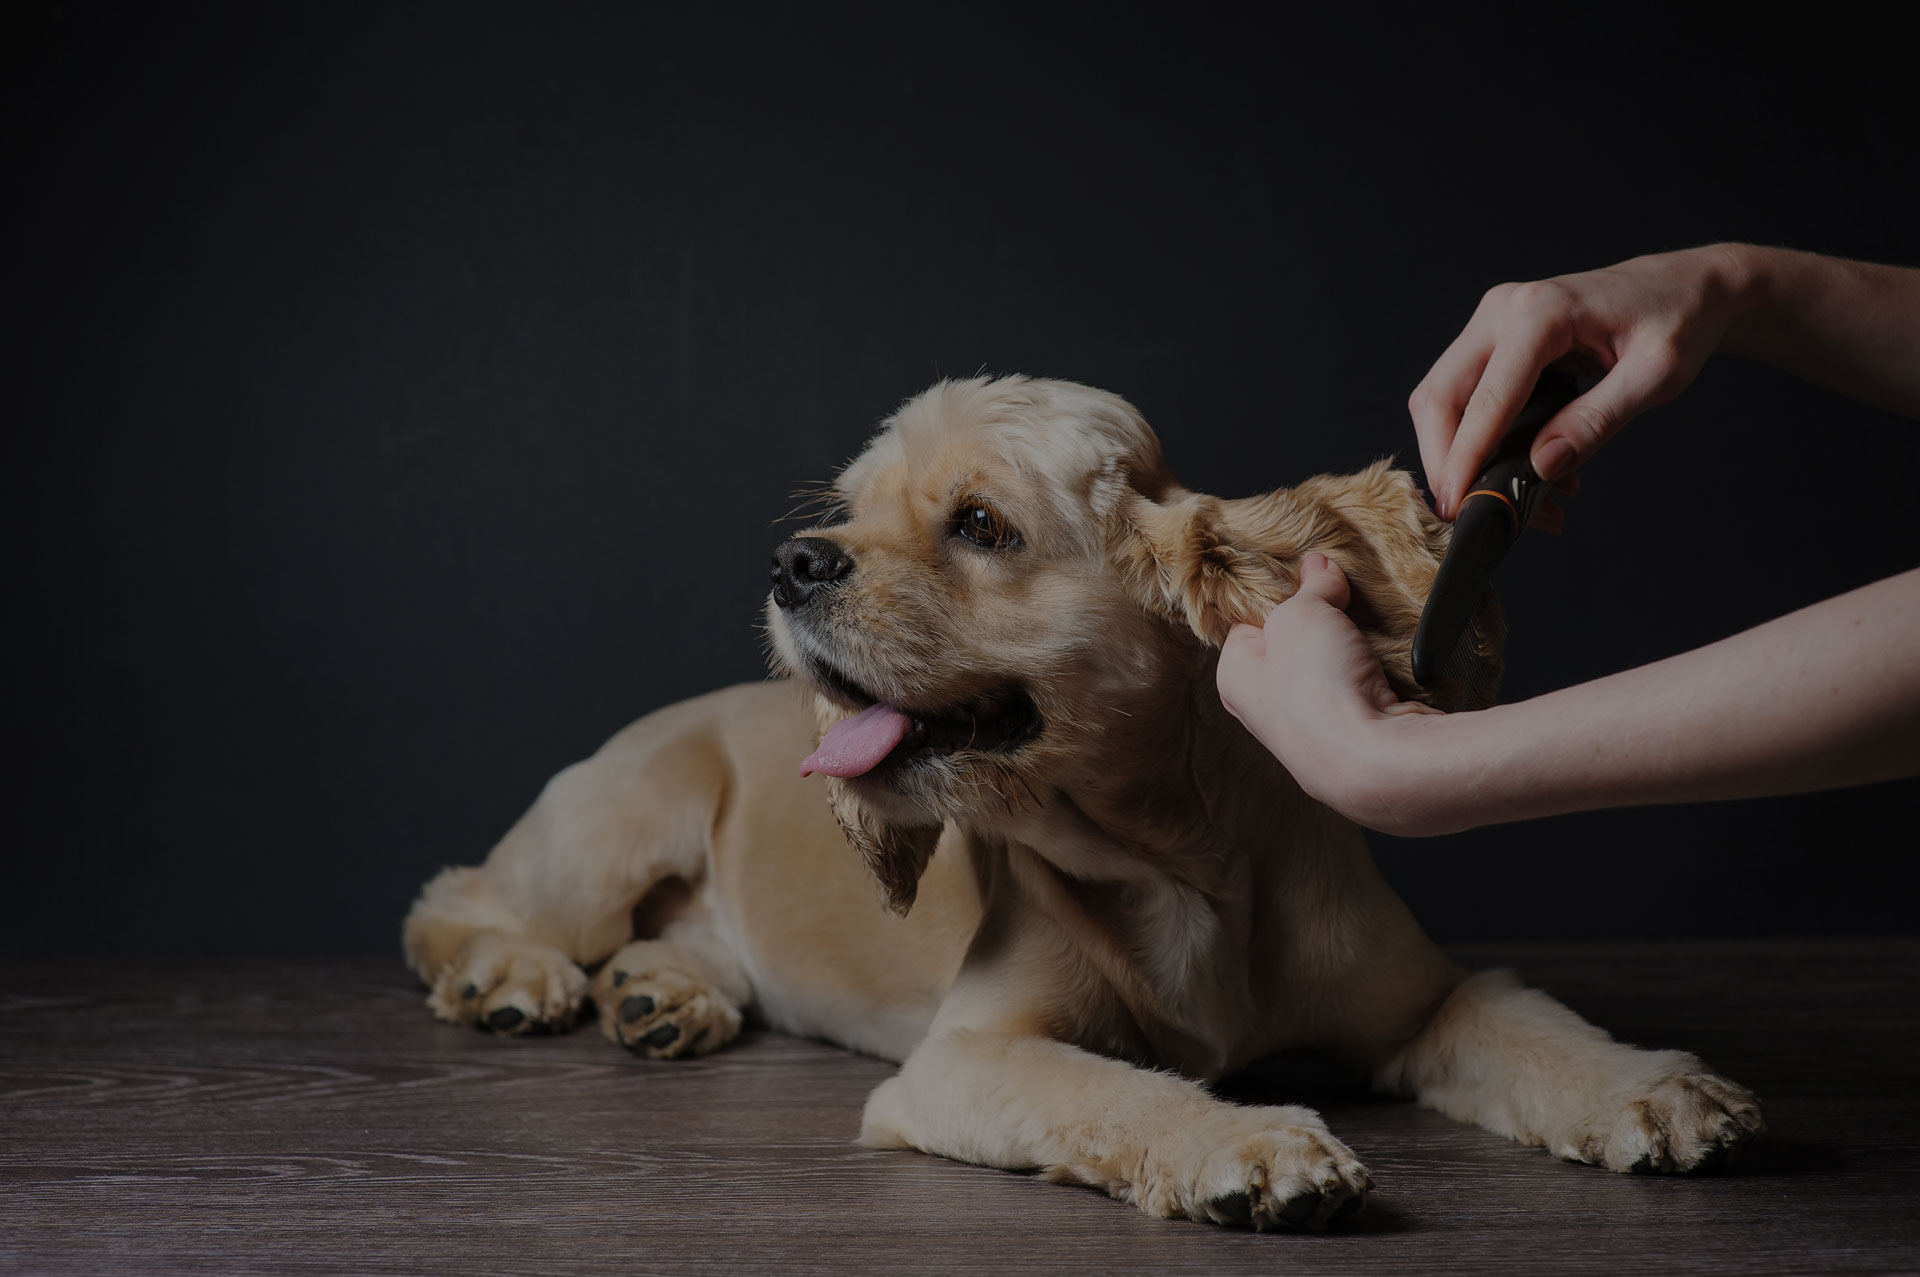 lady straightening dog ear hair